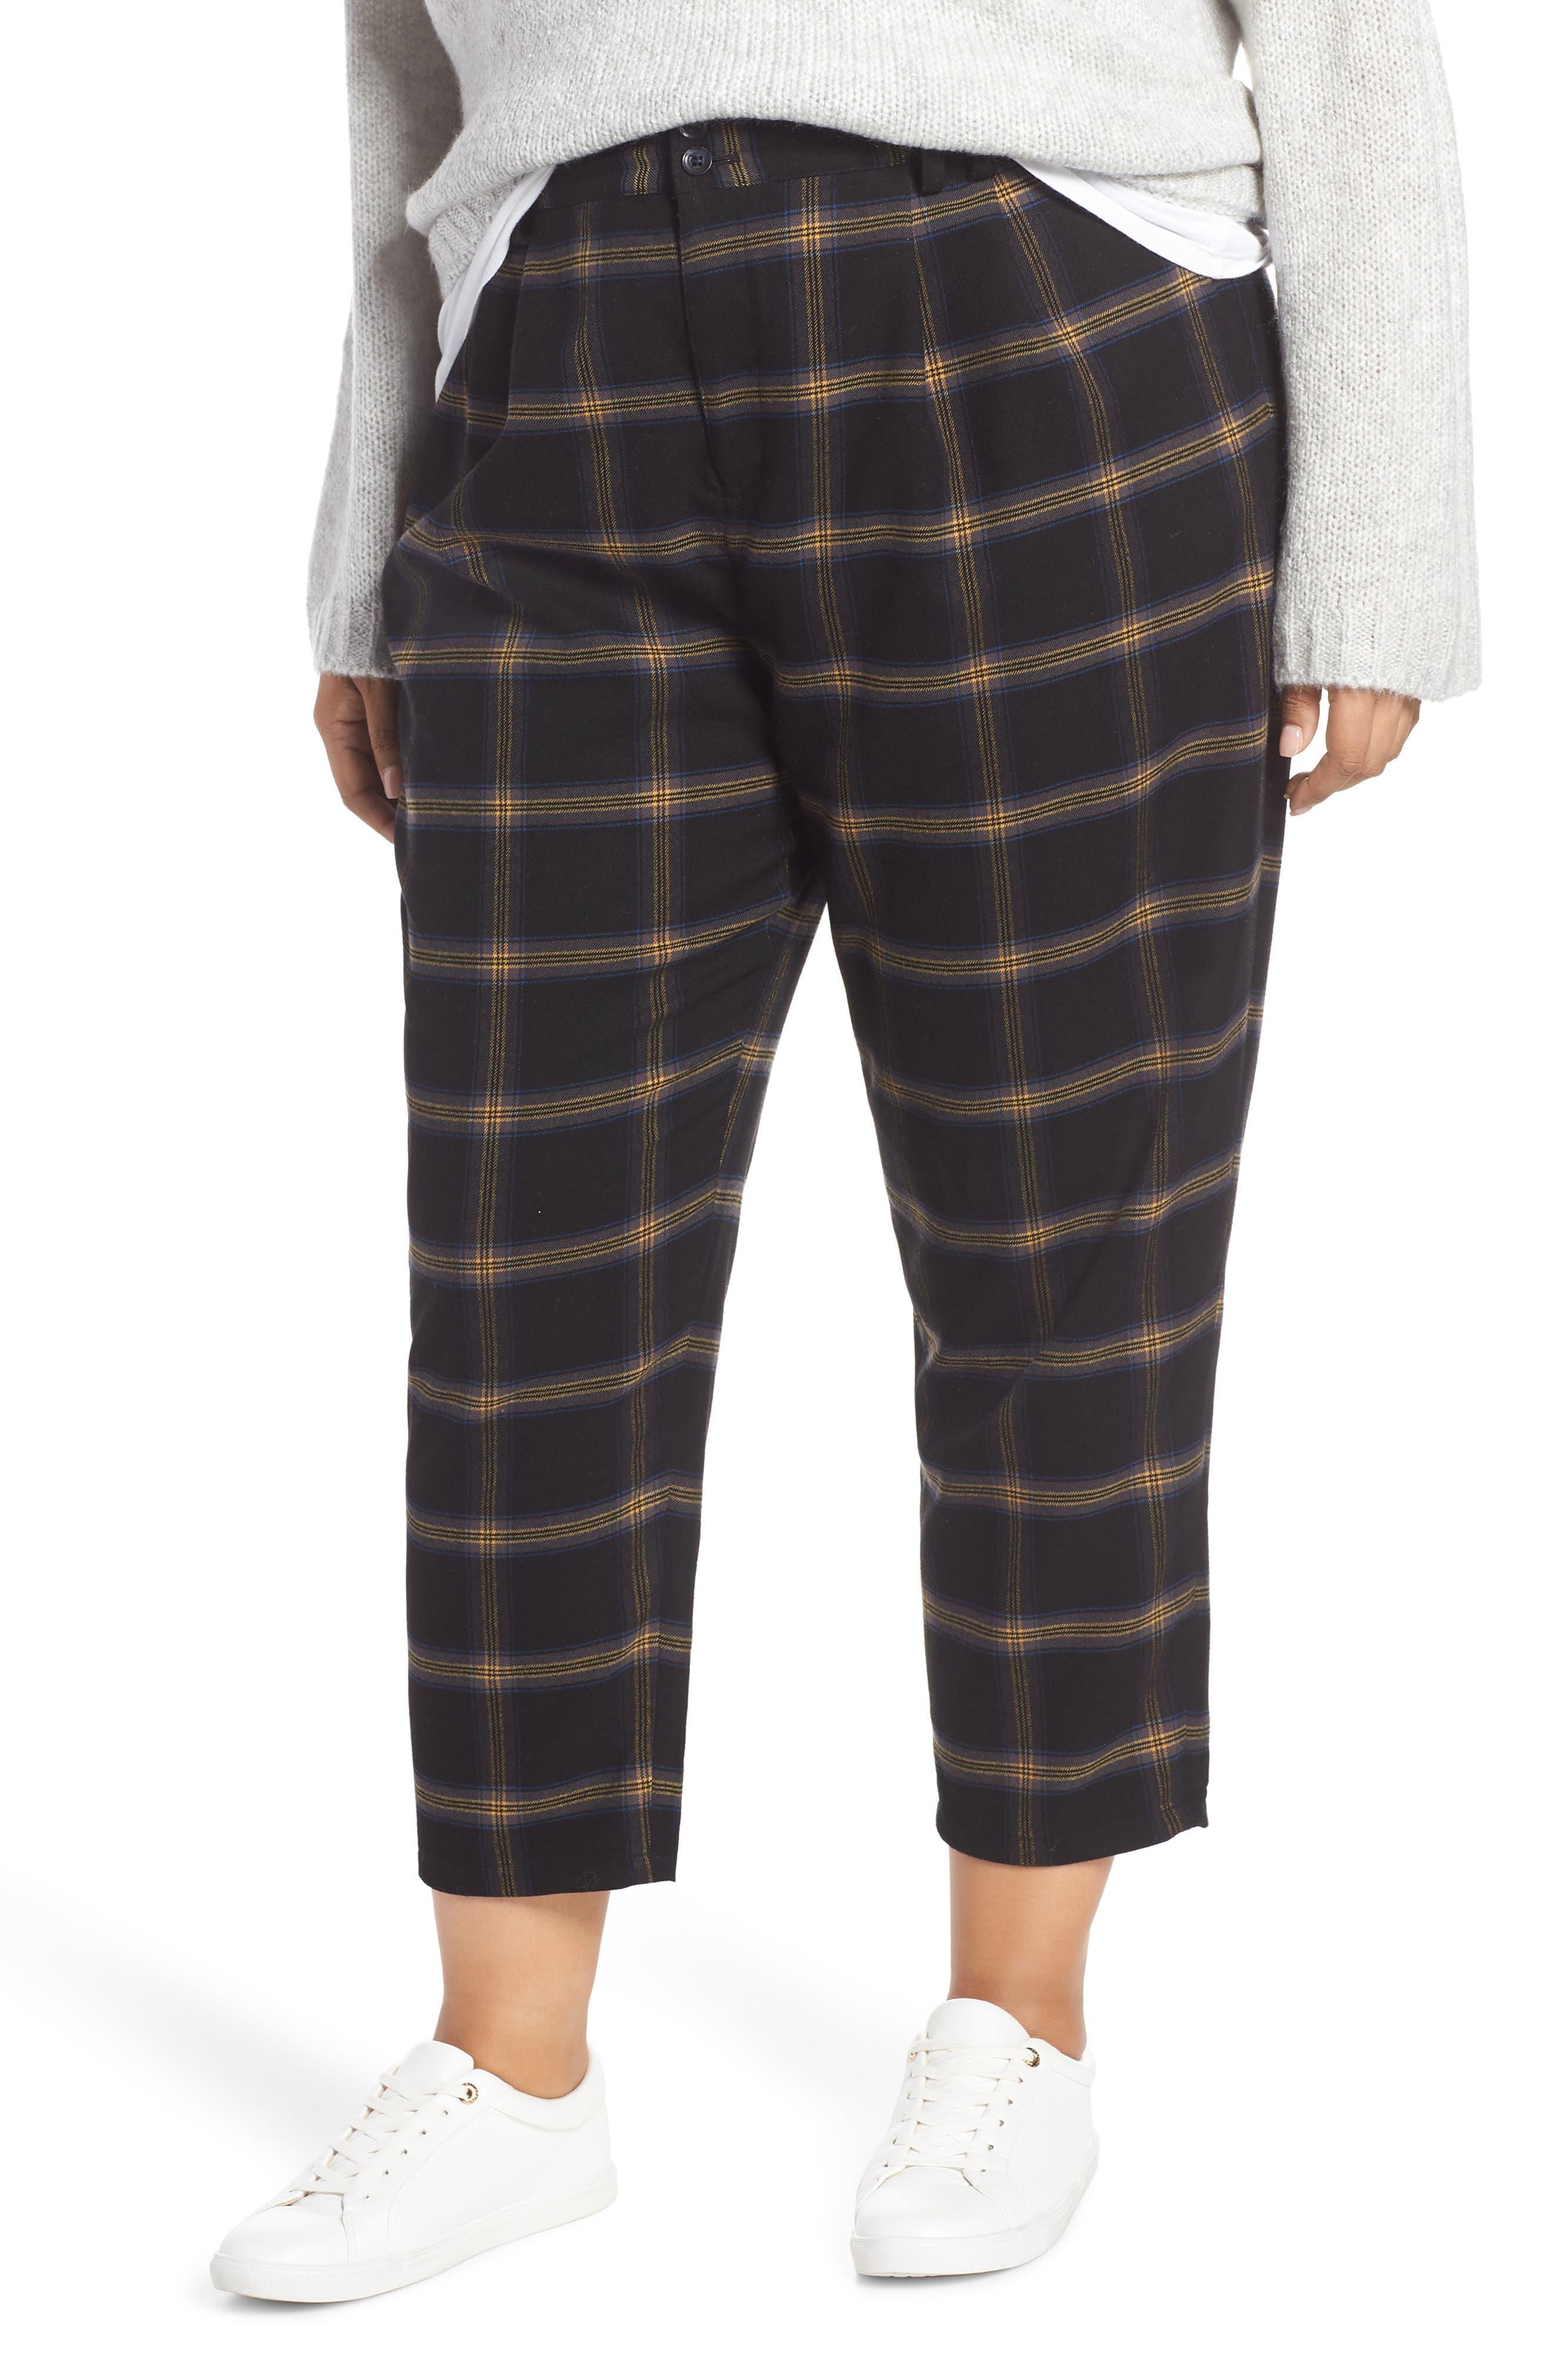 Plaid Menswear Crop Pants,                             Main thumbnail 1, color,                             BLACK SHANNON PLAID